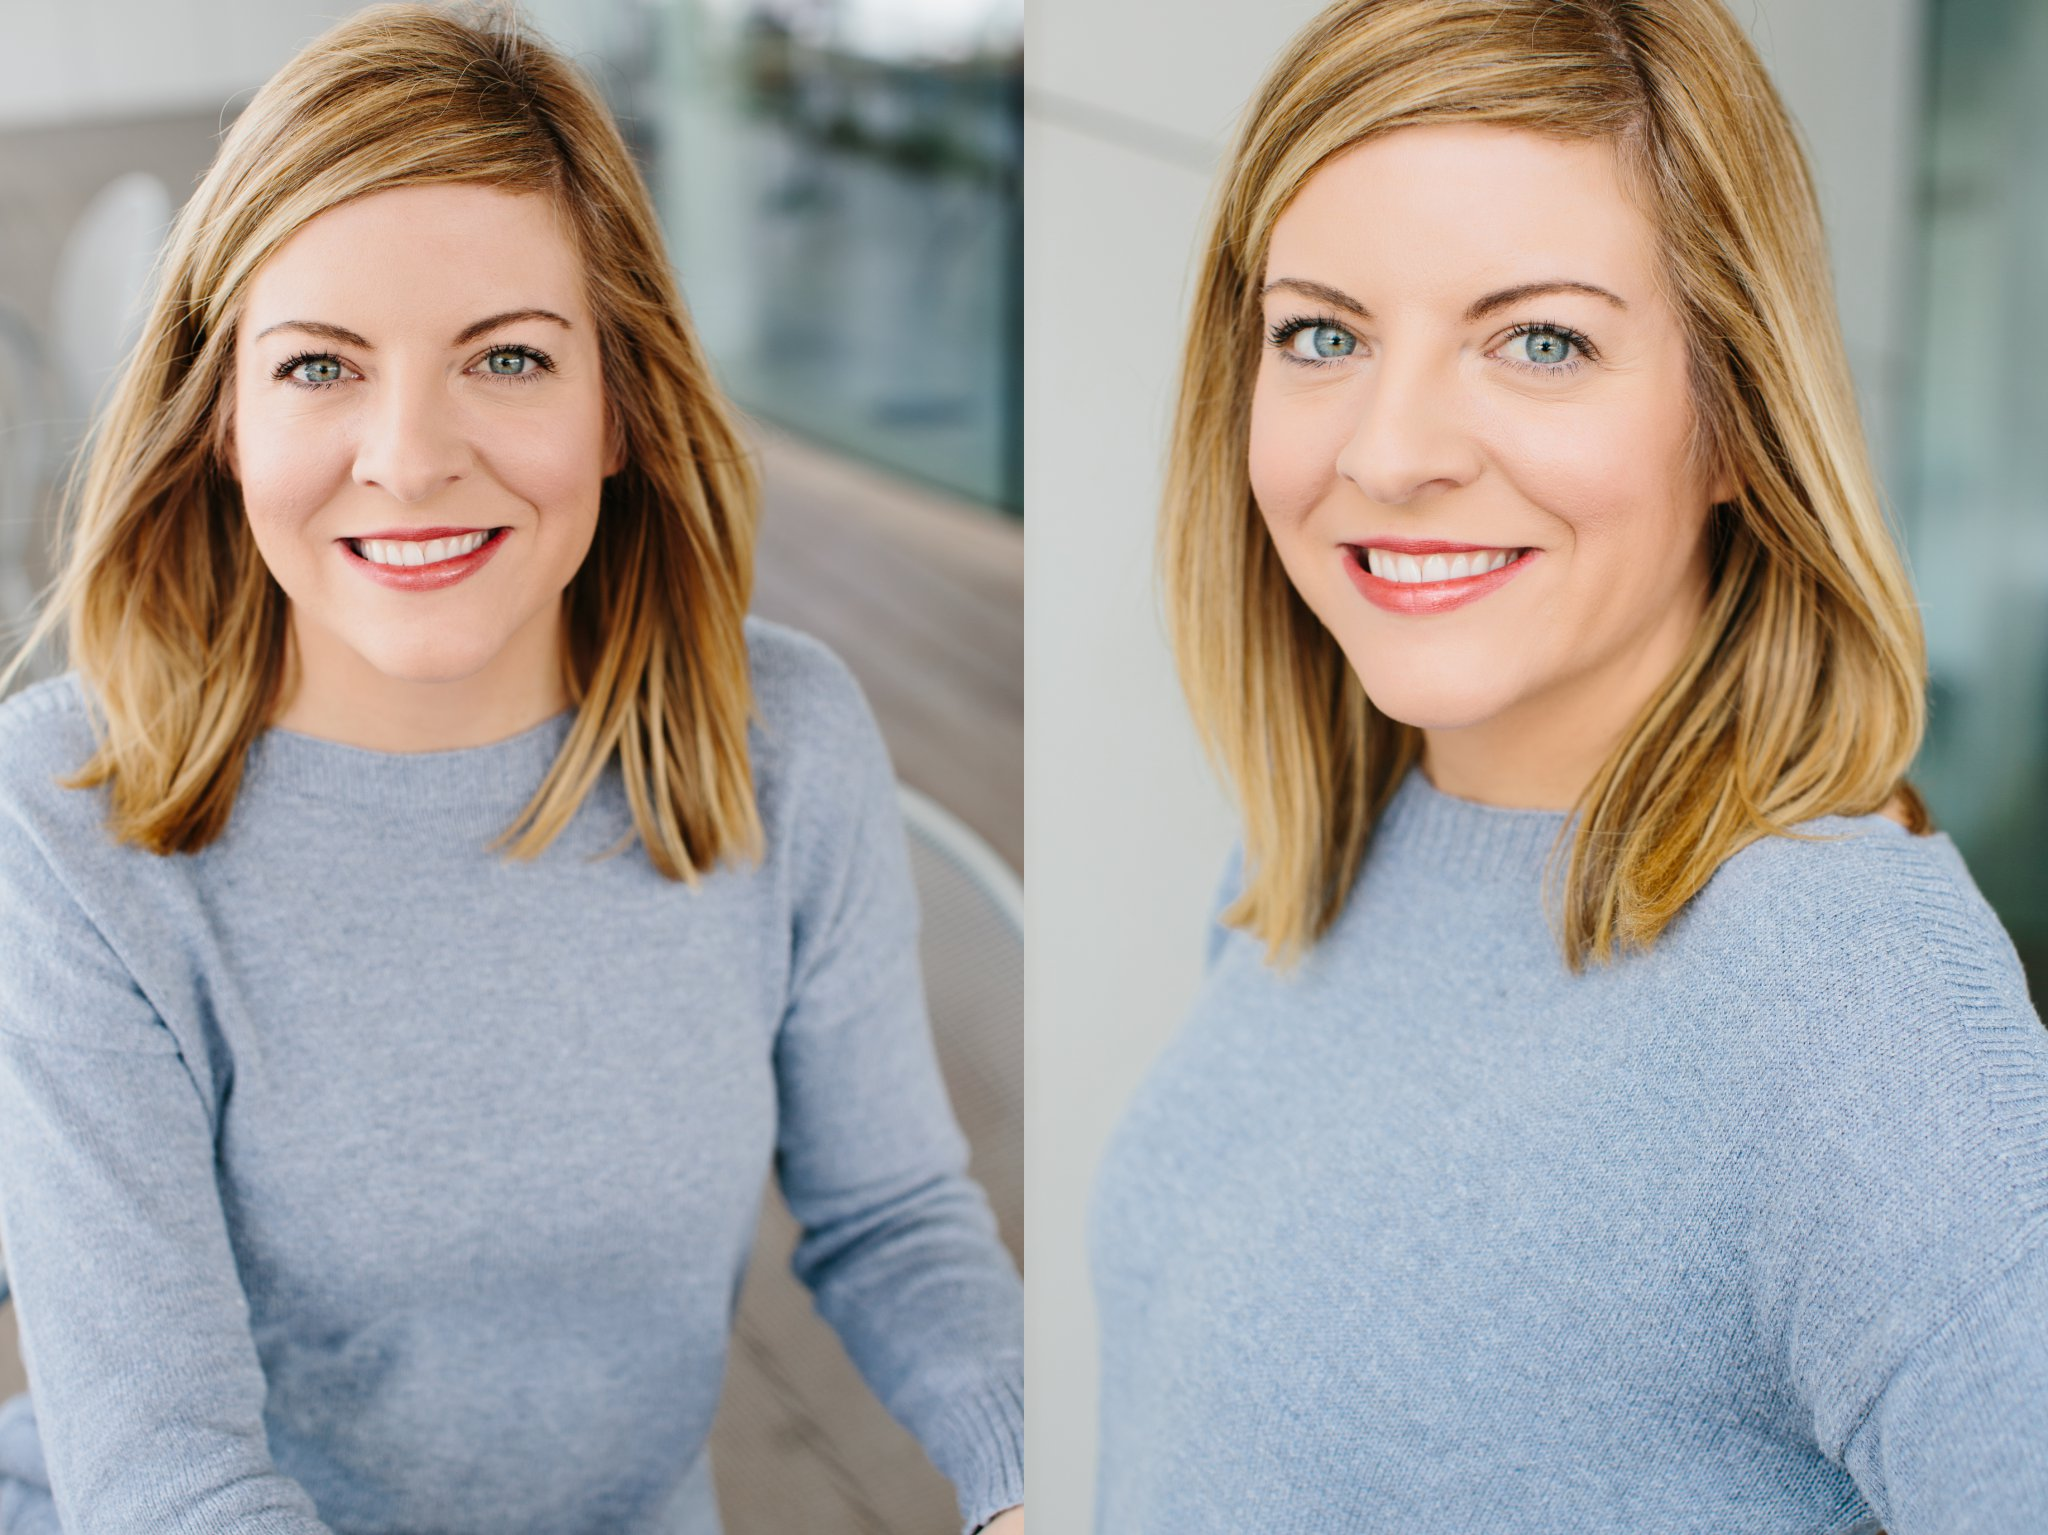 professional-photographers-oklahoma-city-commercial-corporate-headshots.jpg